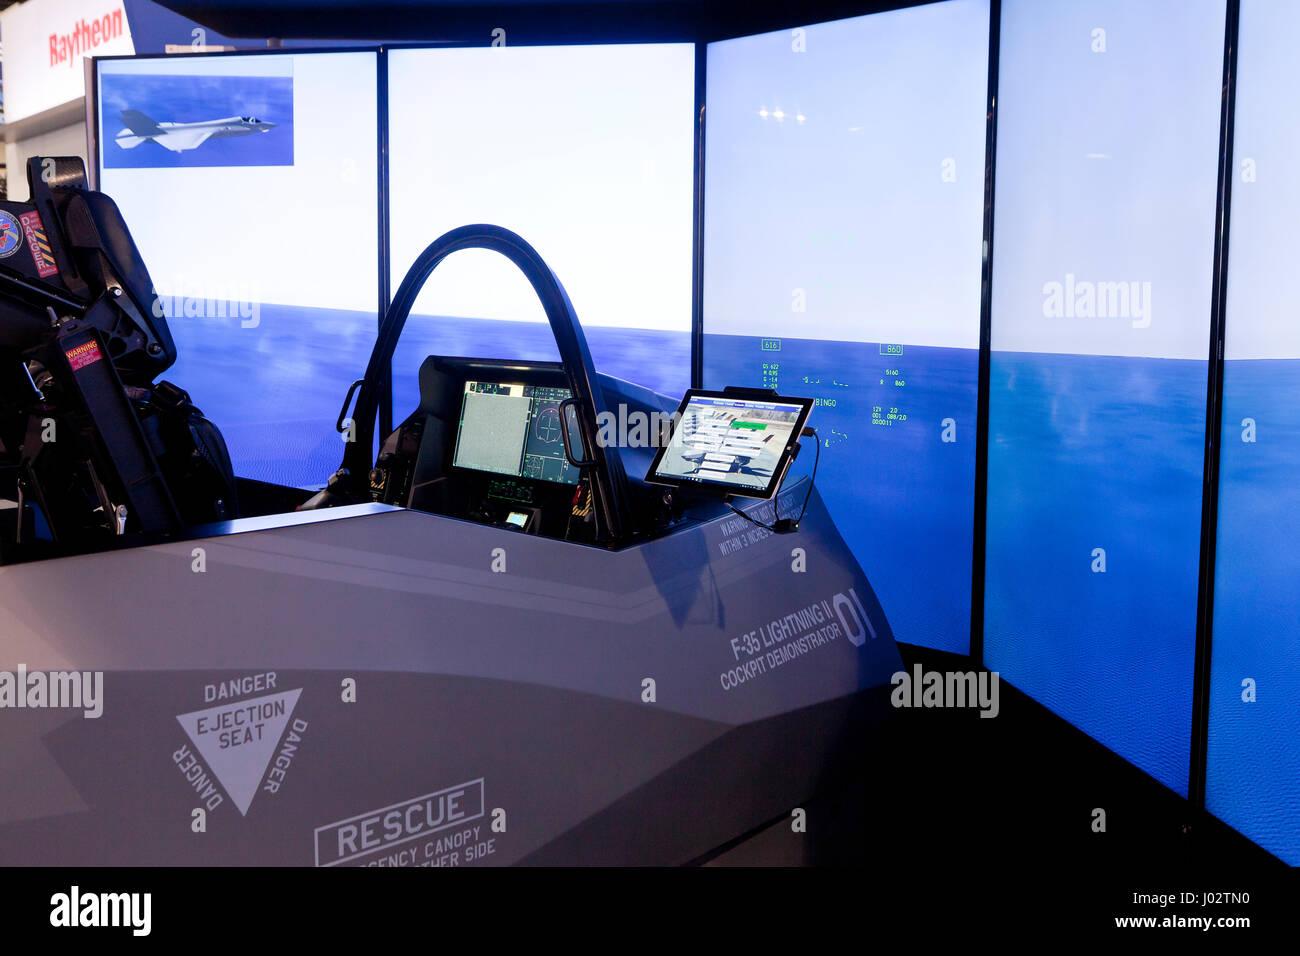 Lockheed Martin F-35 Cockpit Simulator - USA - Stock Image